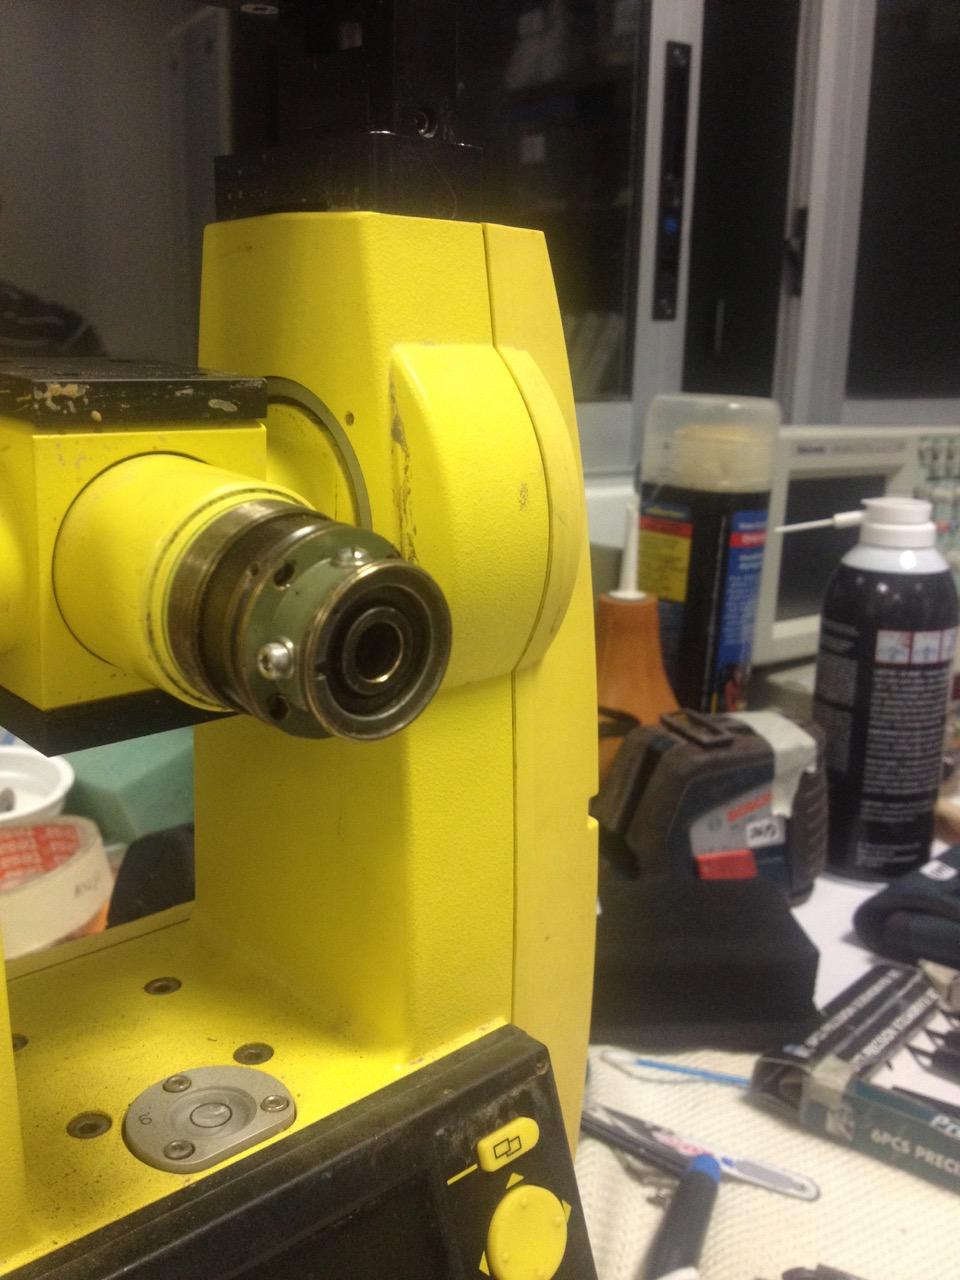 Mantenimiento Preventivo Leica